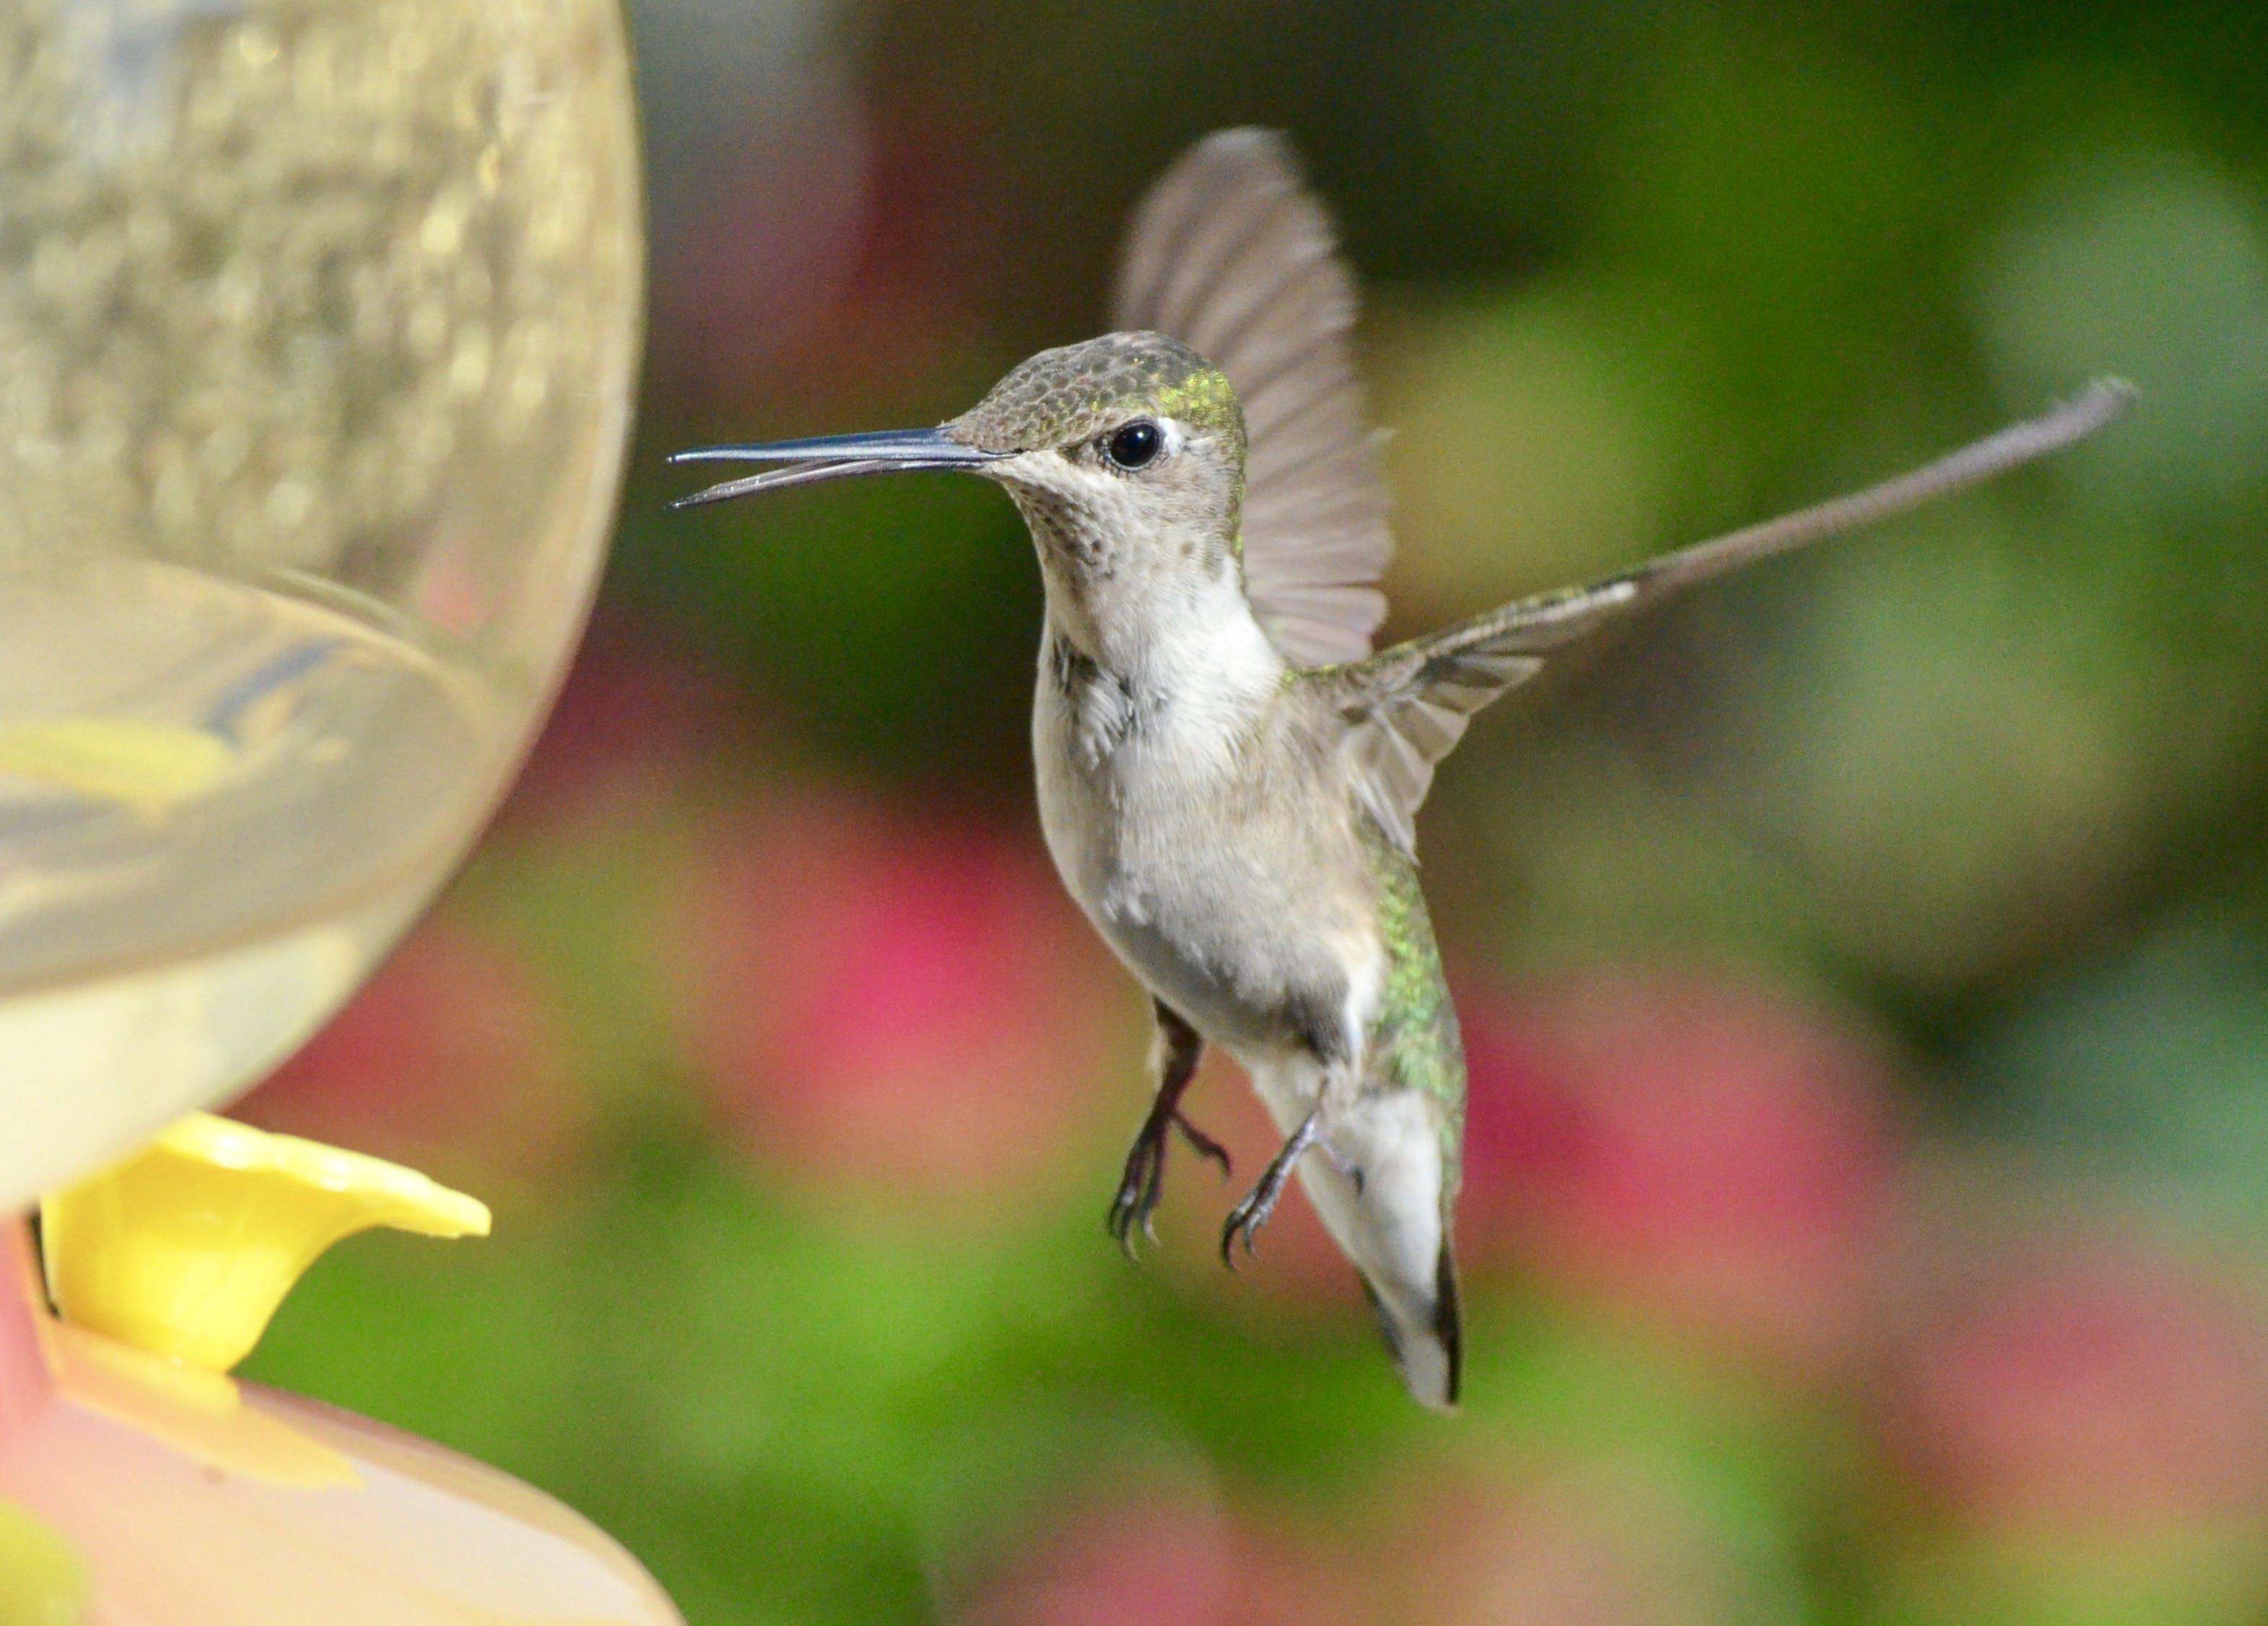 White And Green Hummingbird